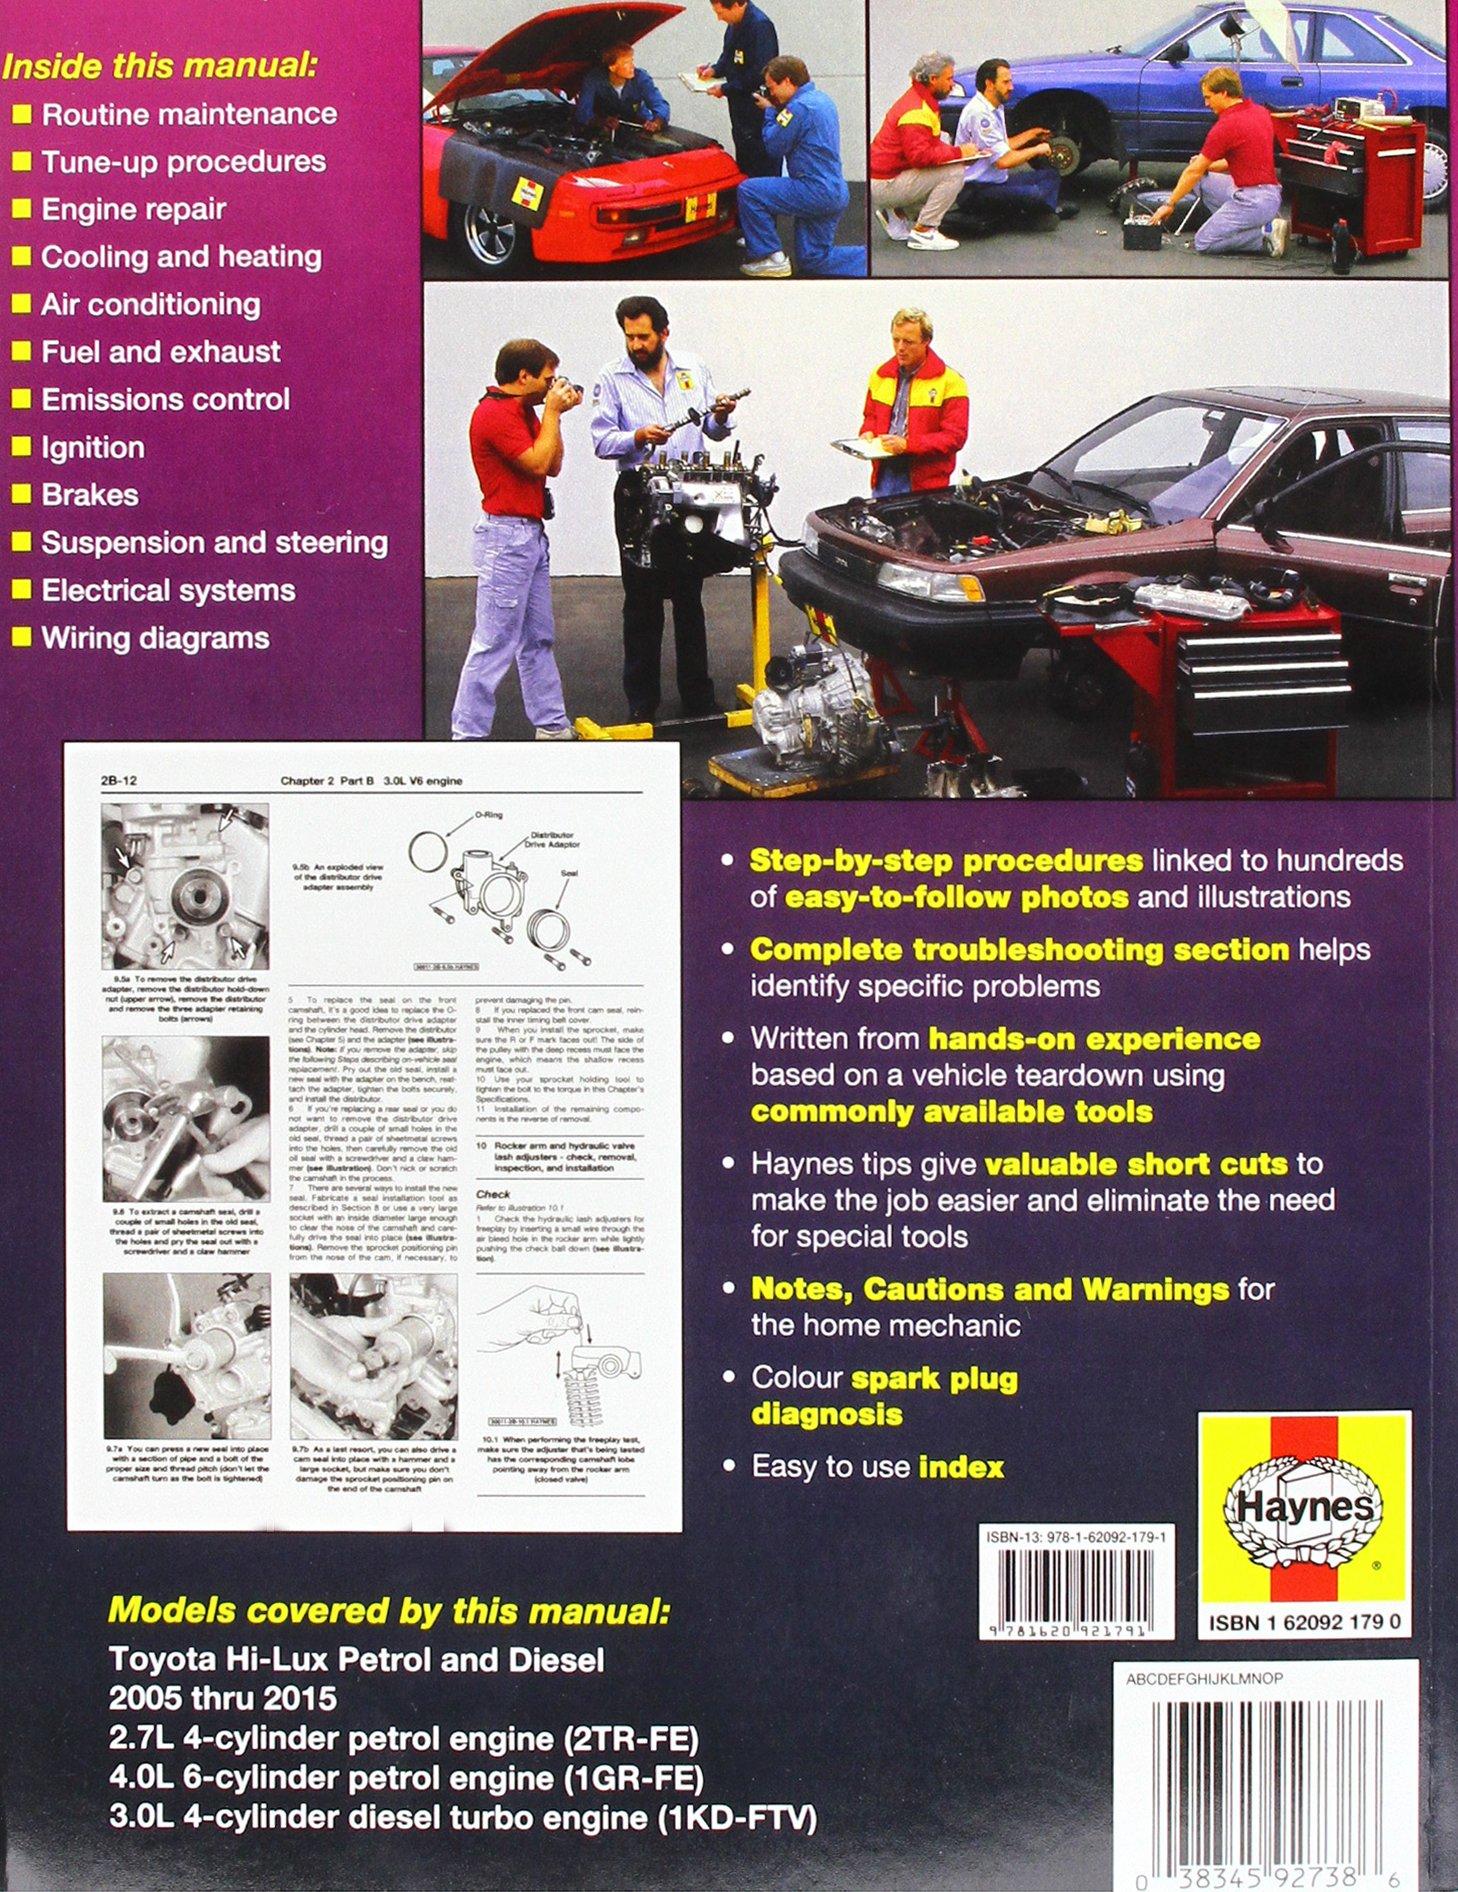 Toyota Hilux 4x4 Aus 2005 2015 Haynes Publishing Fremdsprachige Bücher